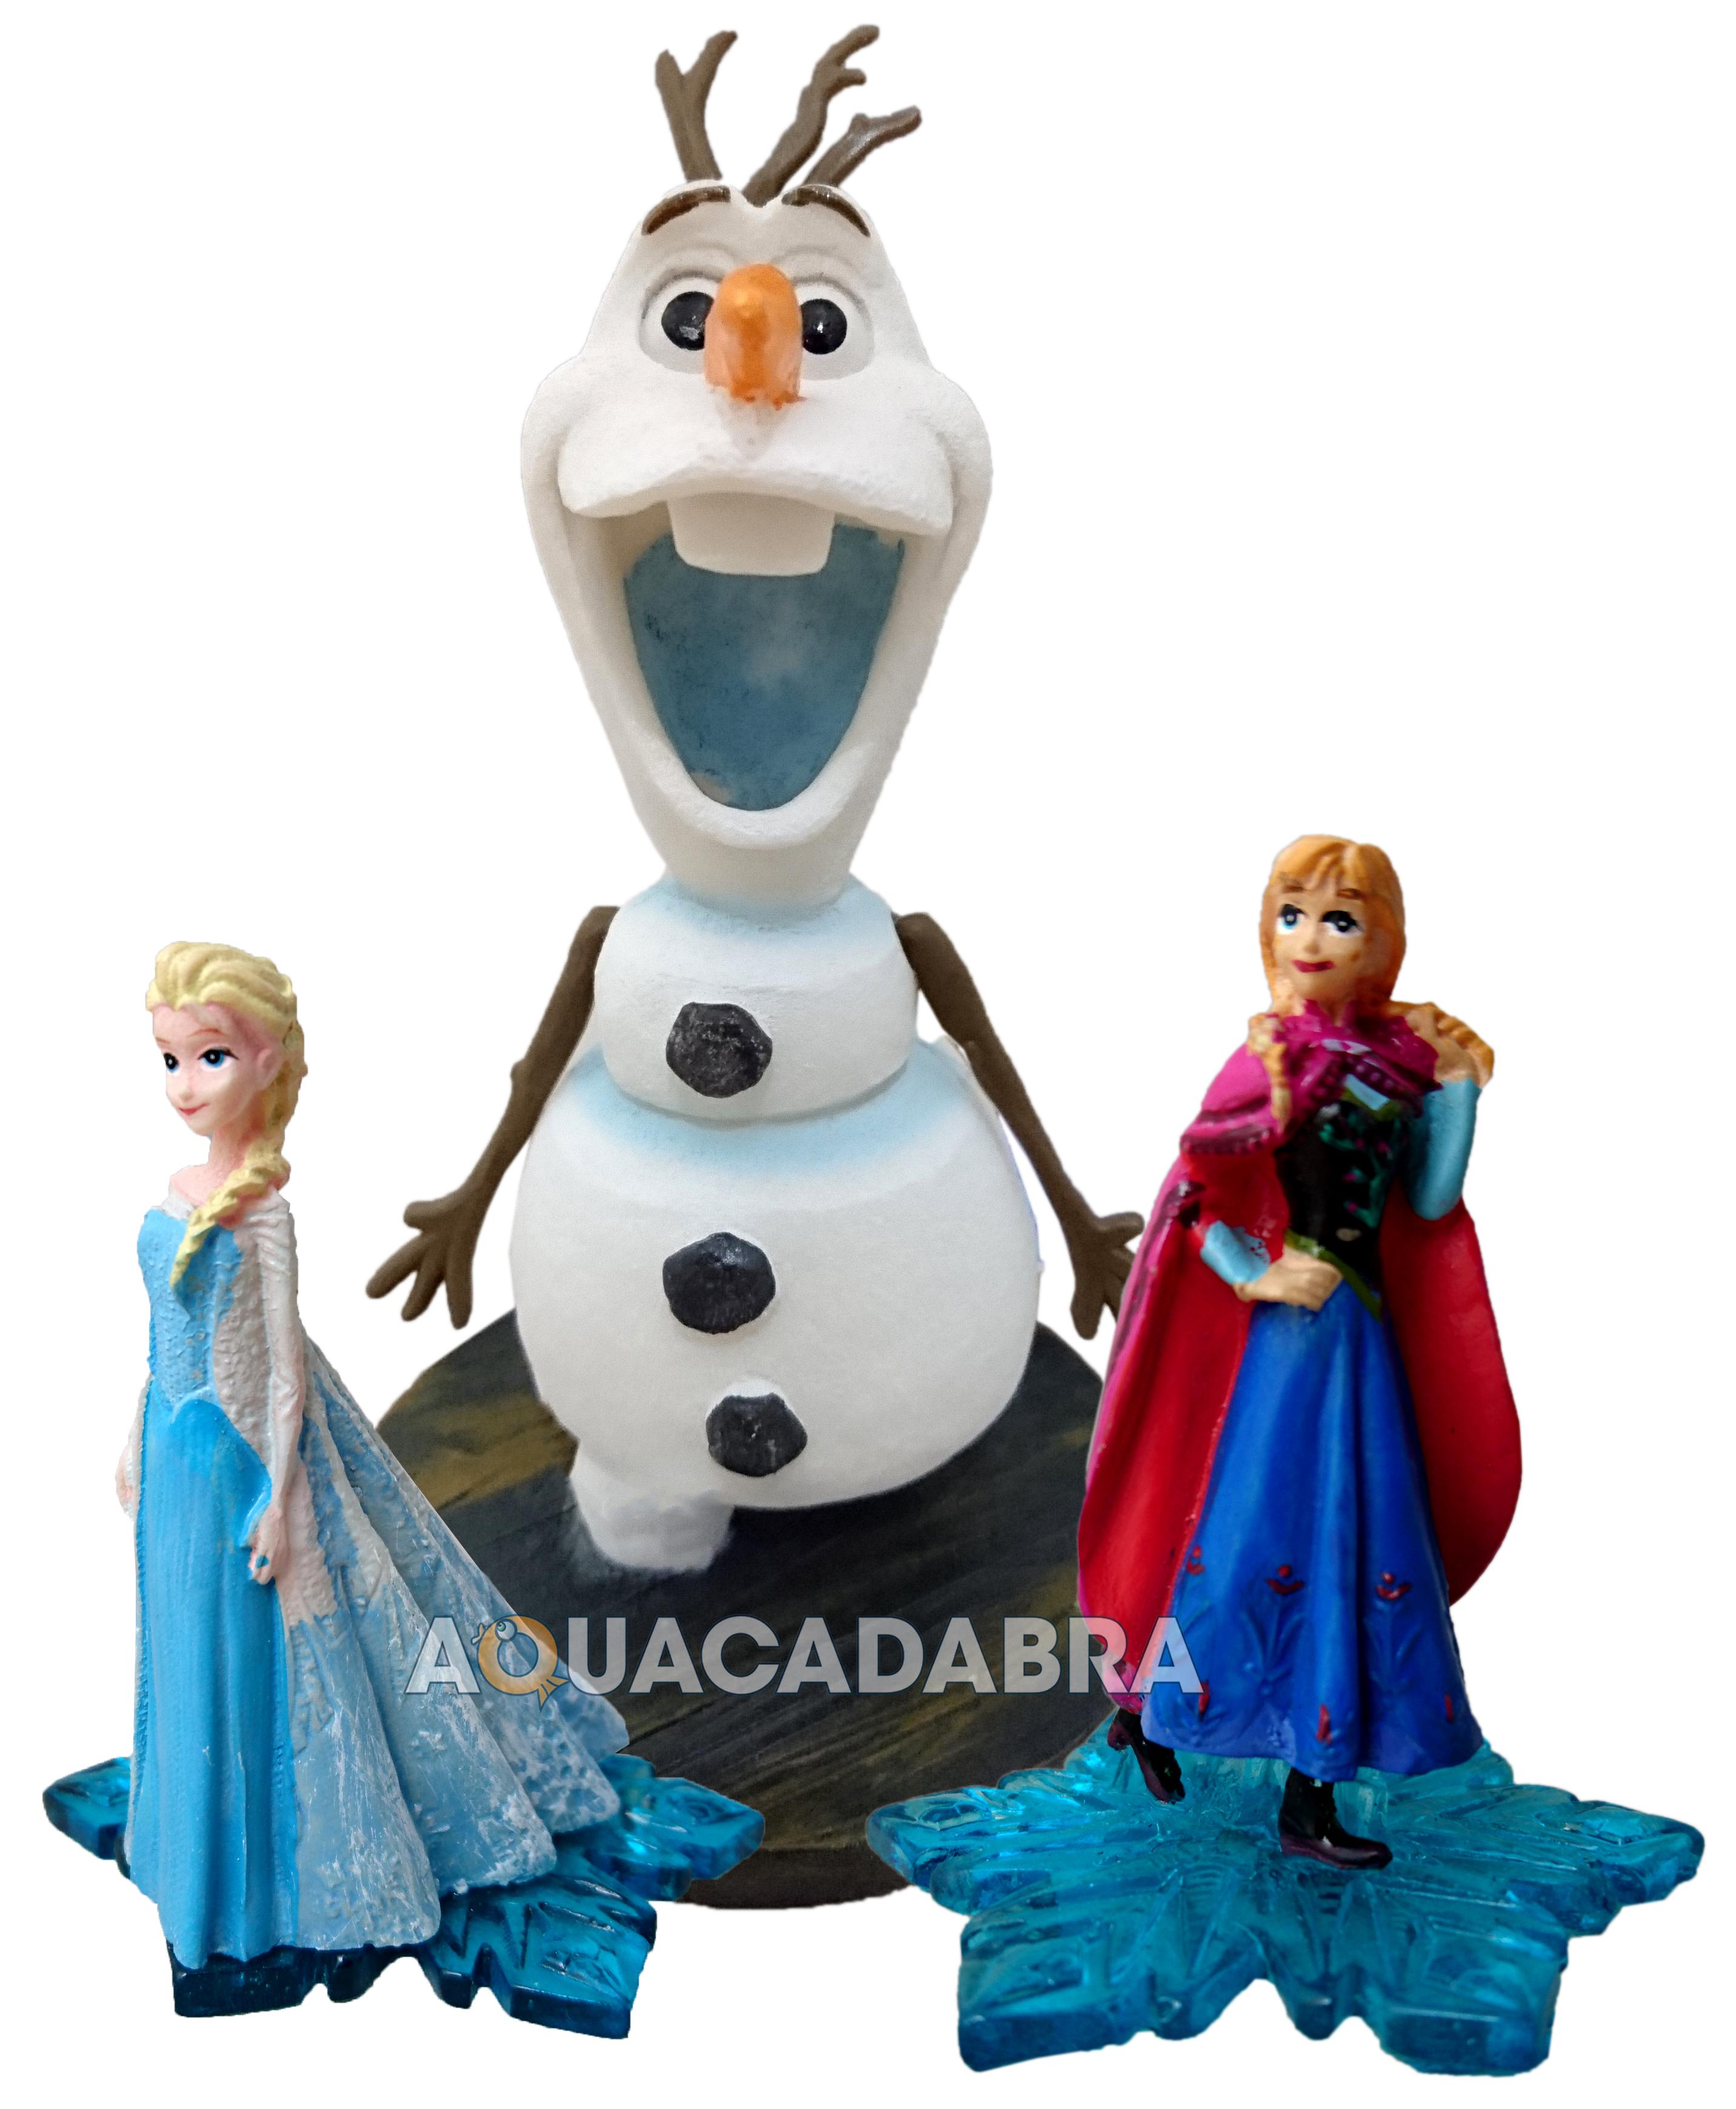 disney frozen elsa anna olaf ice castle ornament penn plax fish